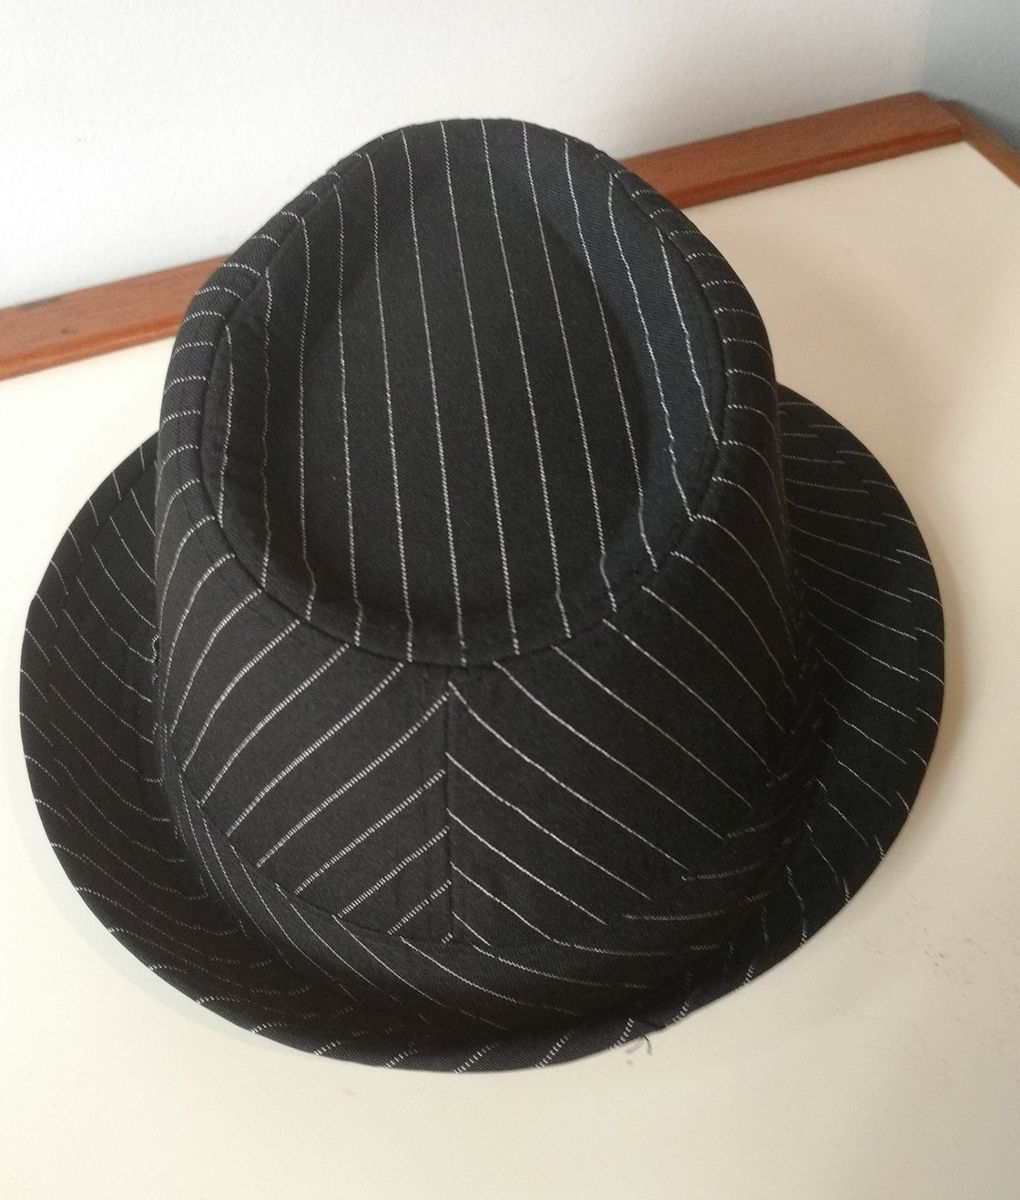 521689b0aea7c chapéu panamá risca de giz - chapeu sem marca.  Czm6ly9wag90b3muzw5qb2vplmnvbs5ici9wcm9kdwn0cy81otgwnzc4lznmzwm5ymjlndlhzdgyzwq2yzc0zty1m2yxnmfjytmzlmpwzw  ...